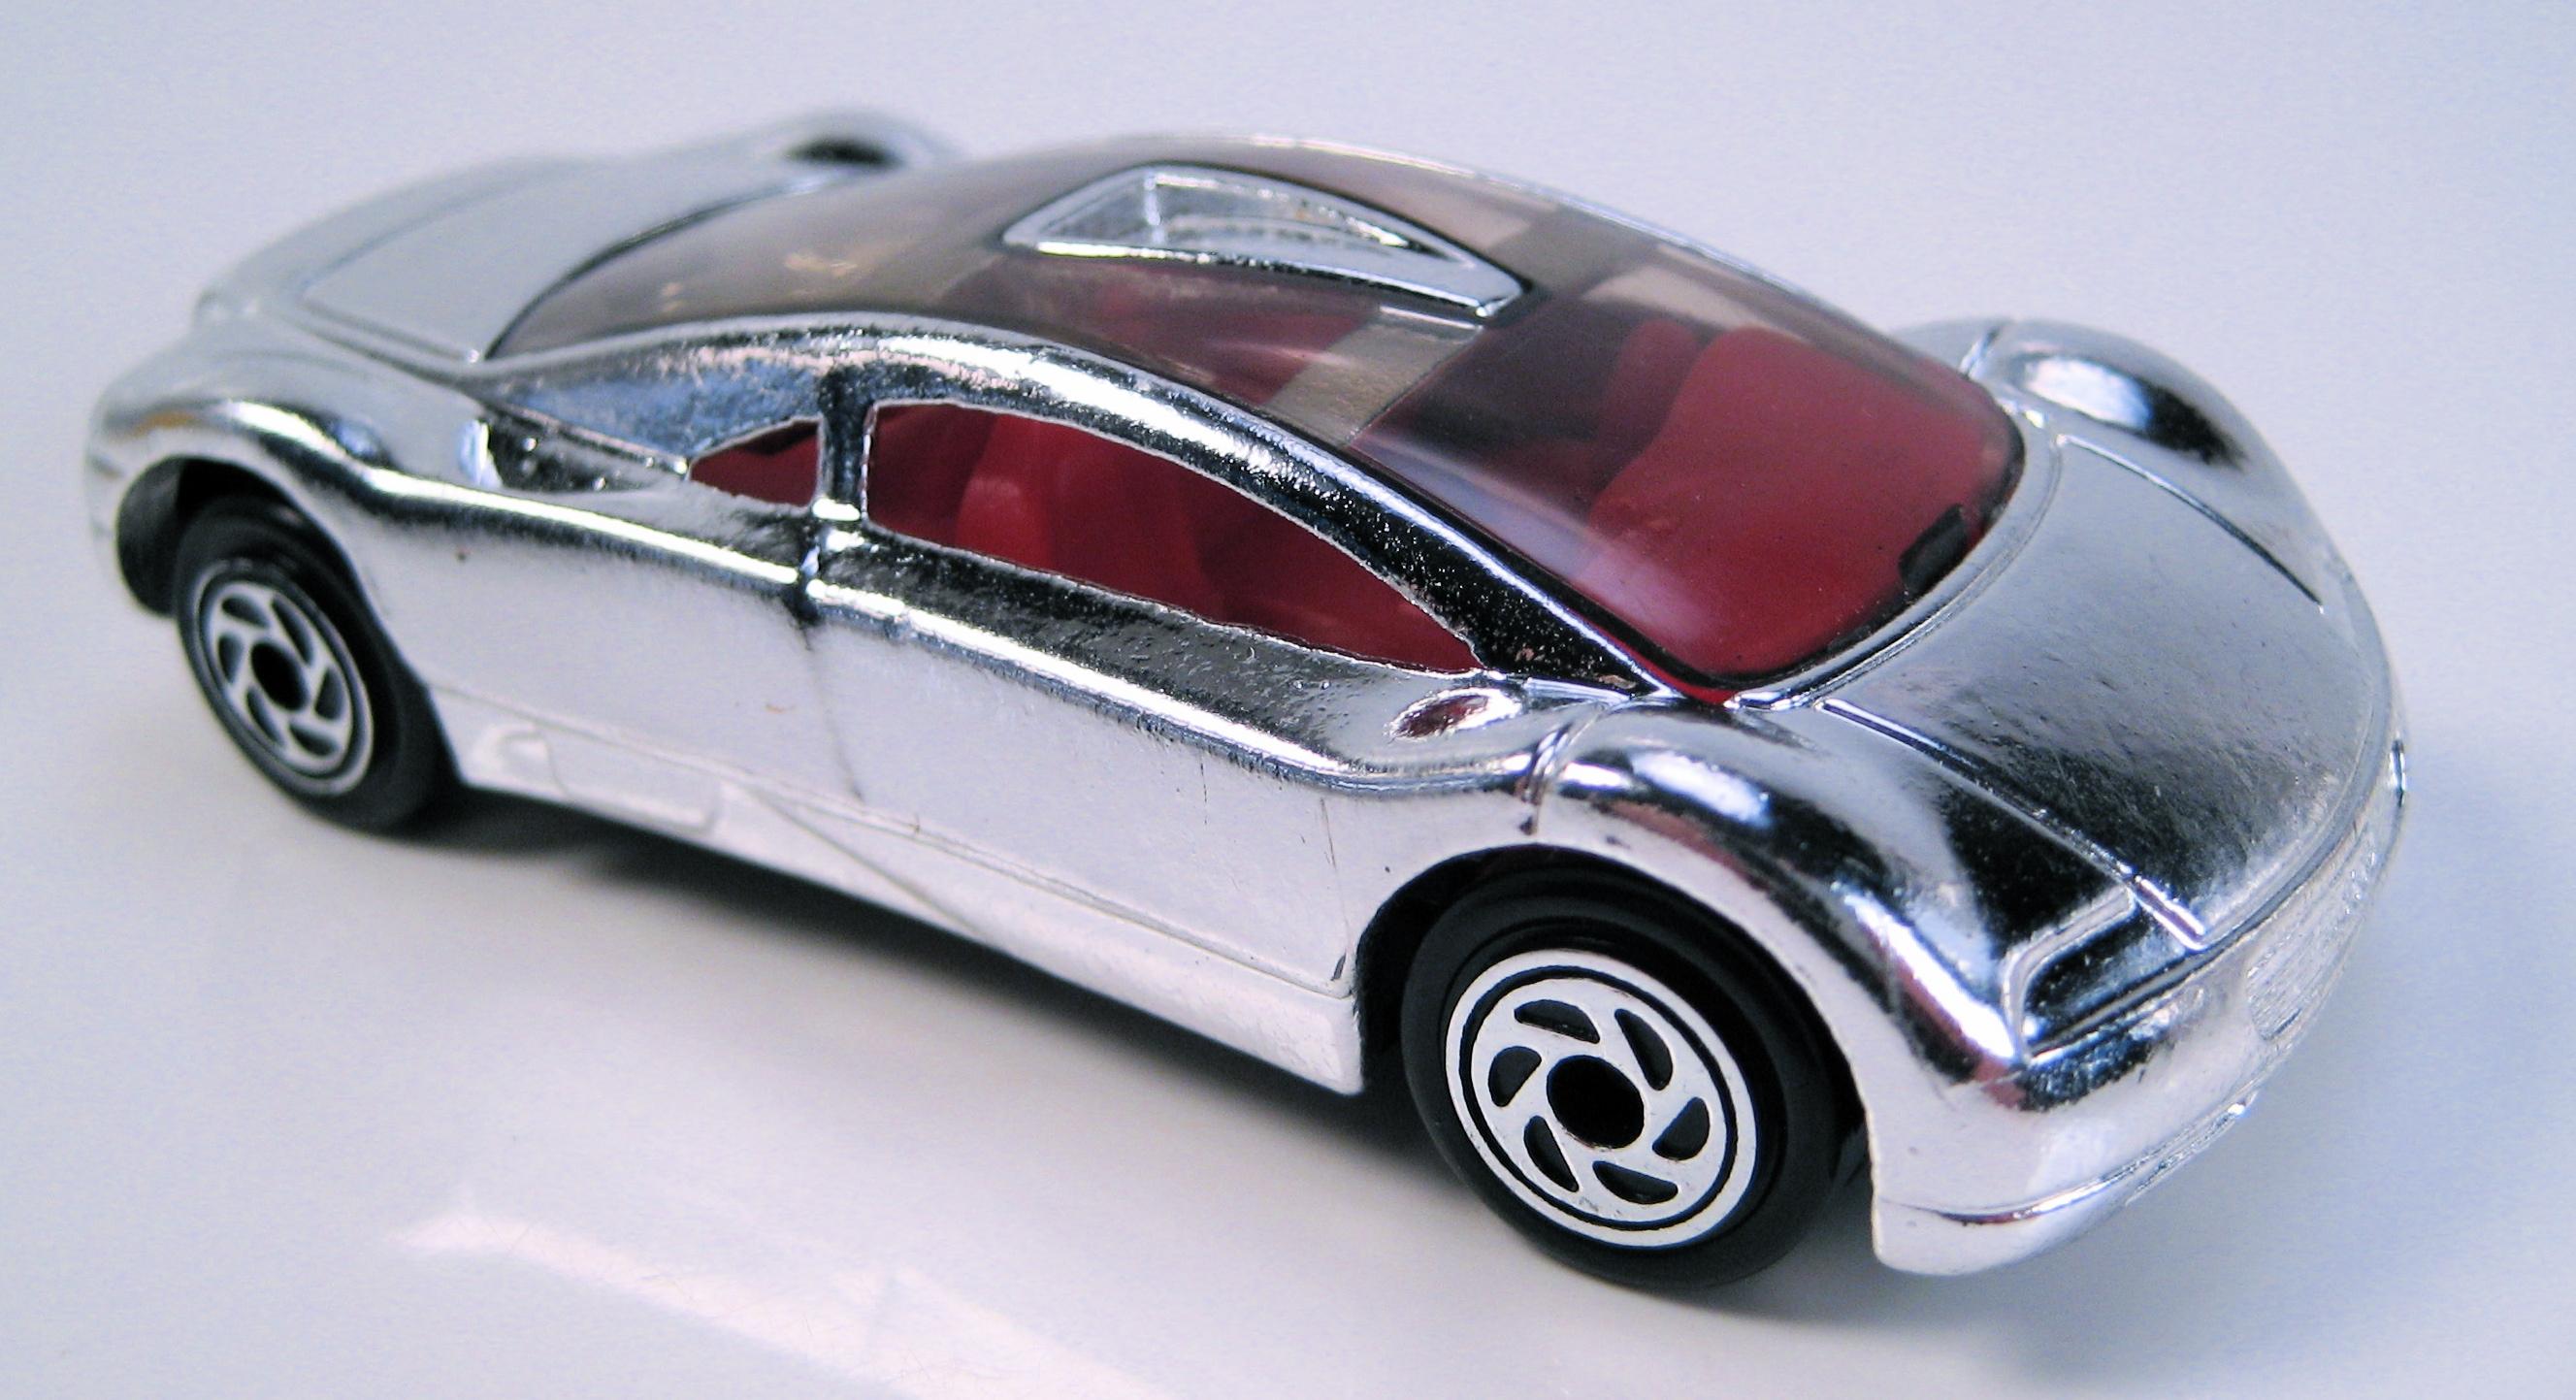 audi avus quattro matchbox cars wiki. Black Bedroom Furniture Sets. Home Design Ideas